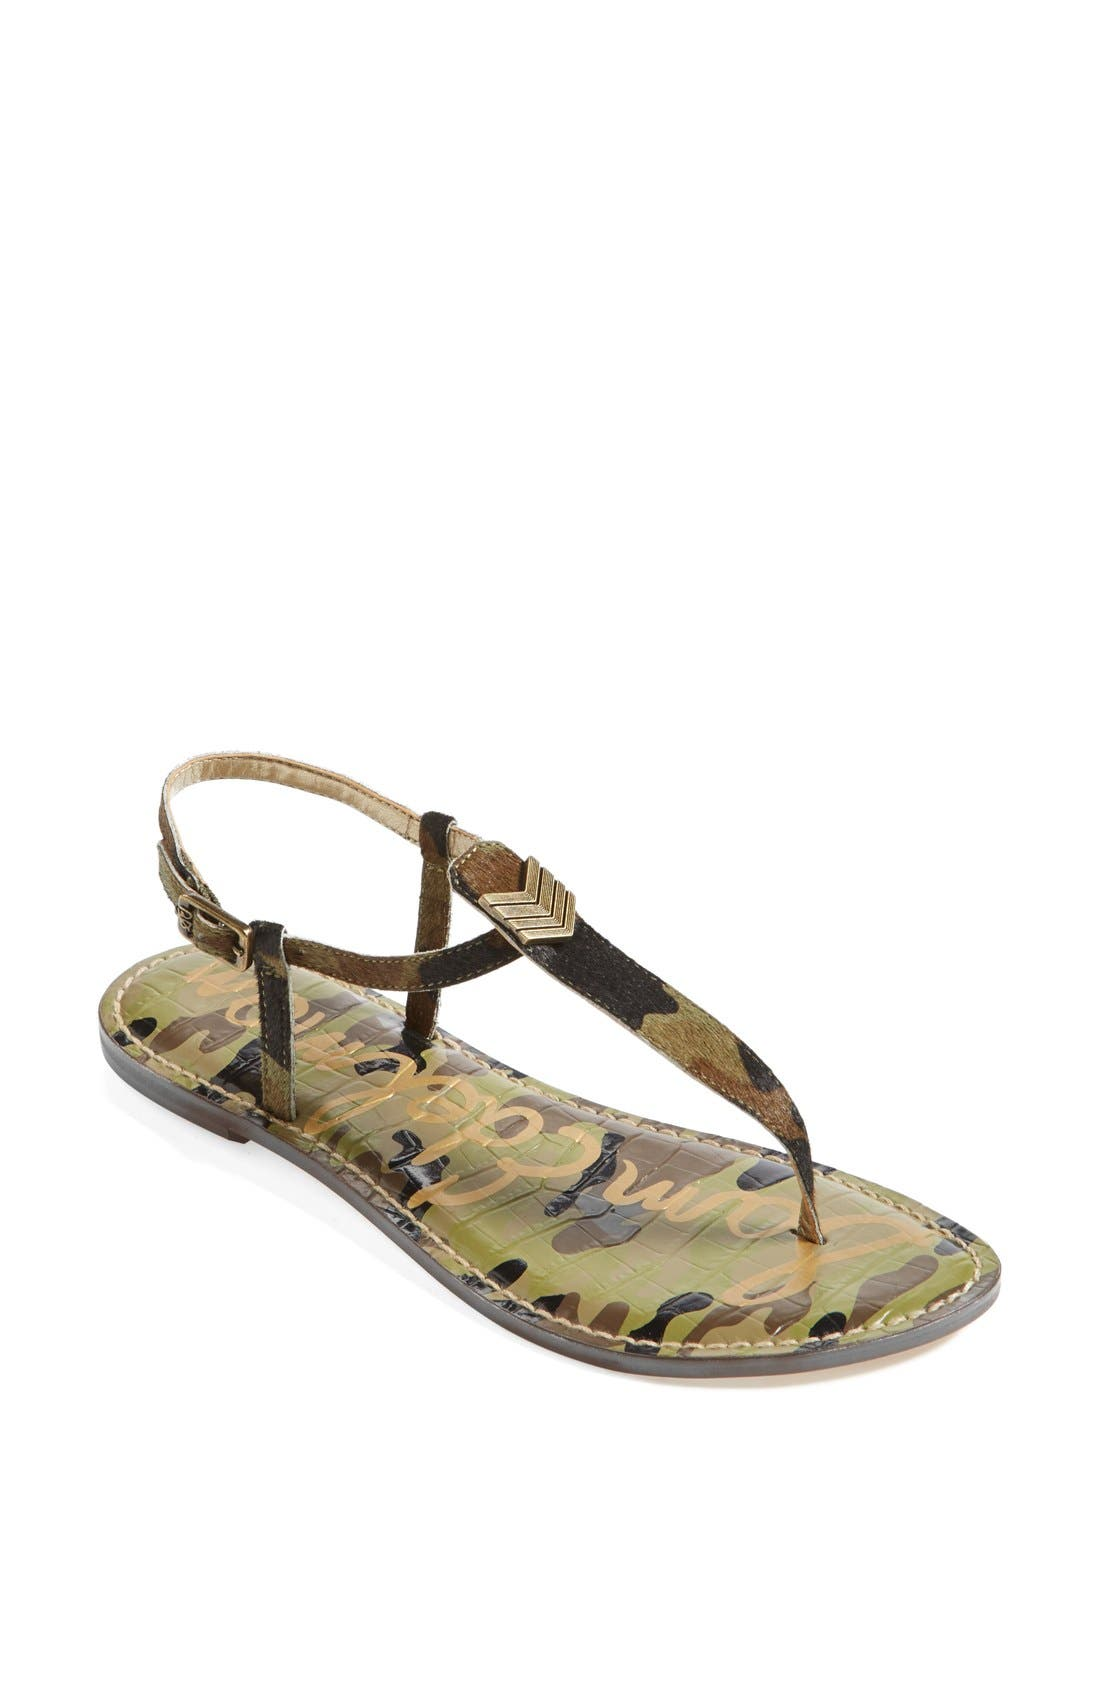 Alternate Image 1 Selected - Sam Edelman 'Gigi' Sandal (Limited Edition)